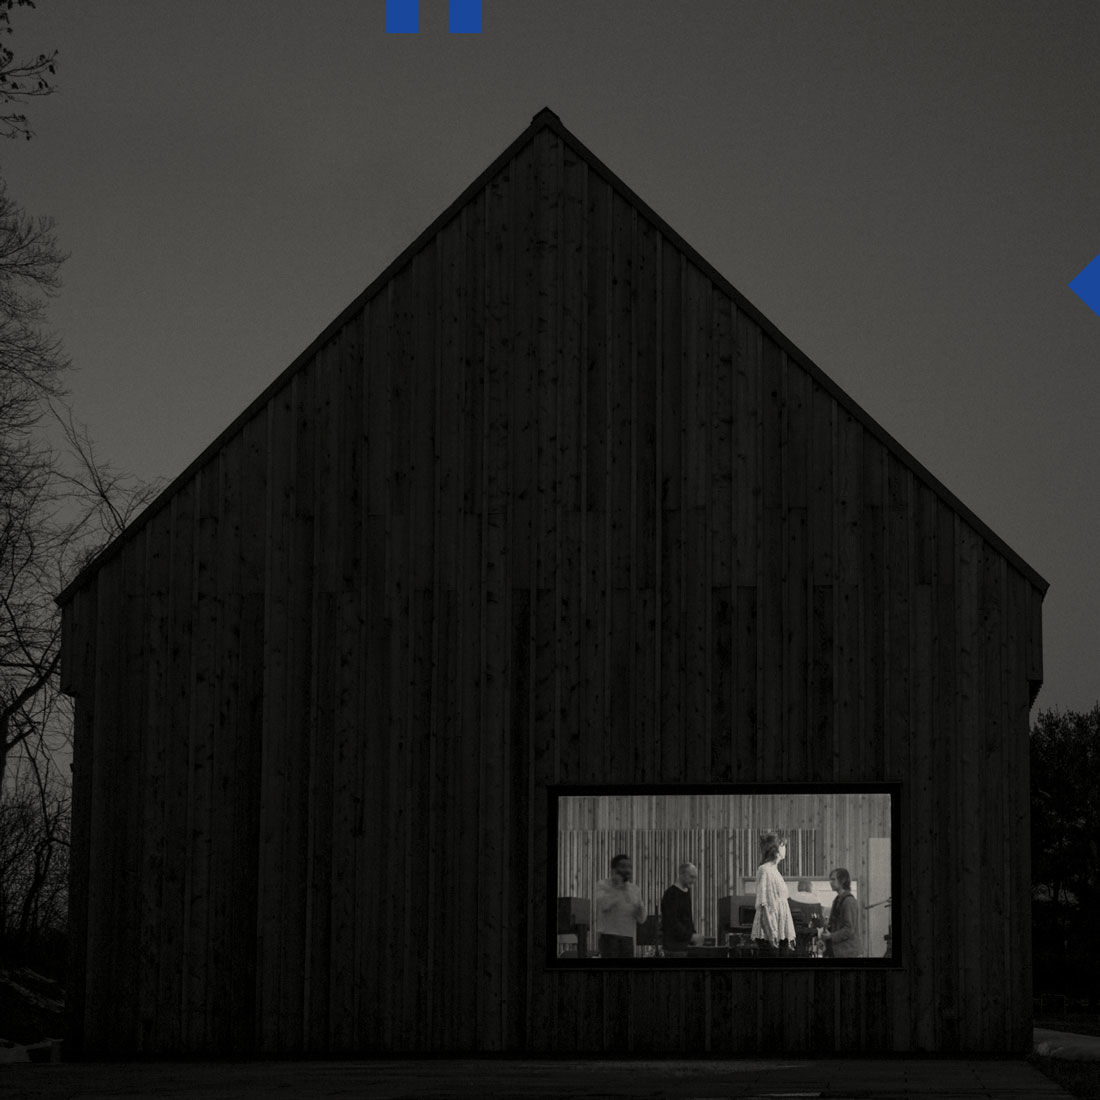 Aural Impressions: The National, Sleep WellBeast